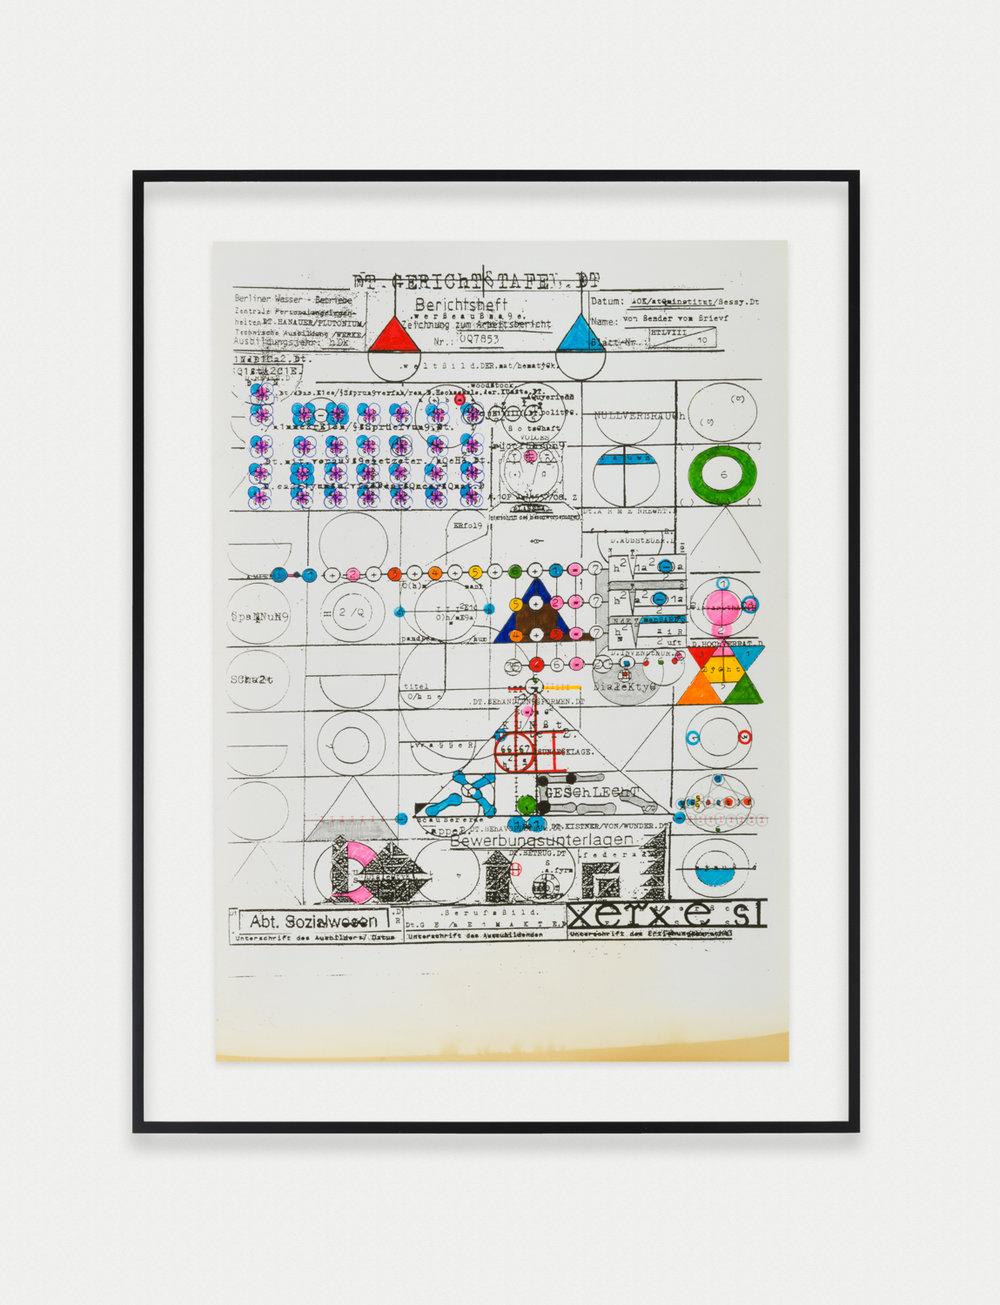 Adelhyd van Bender Untitled 1999-2014 Mixed media on photocopy 16.5 x 11.75 in (41.91h x 29.85w cm) AVB024